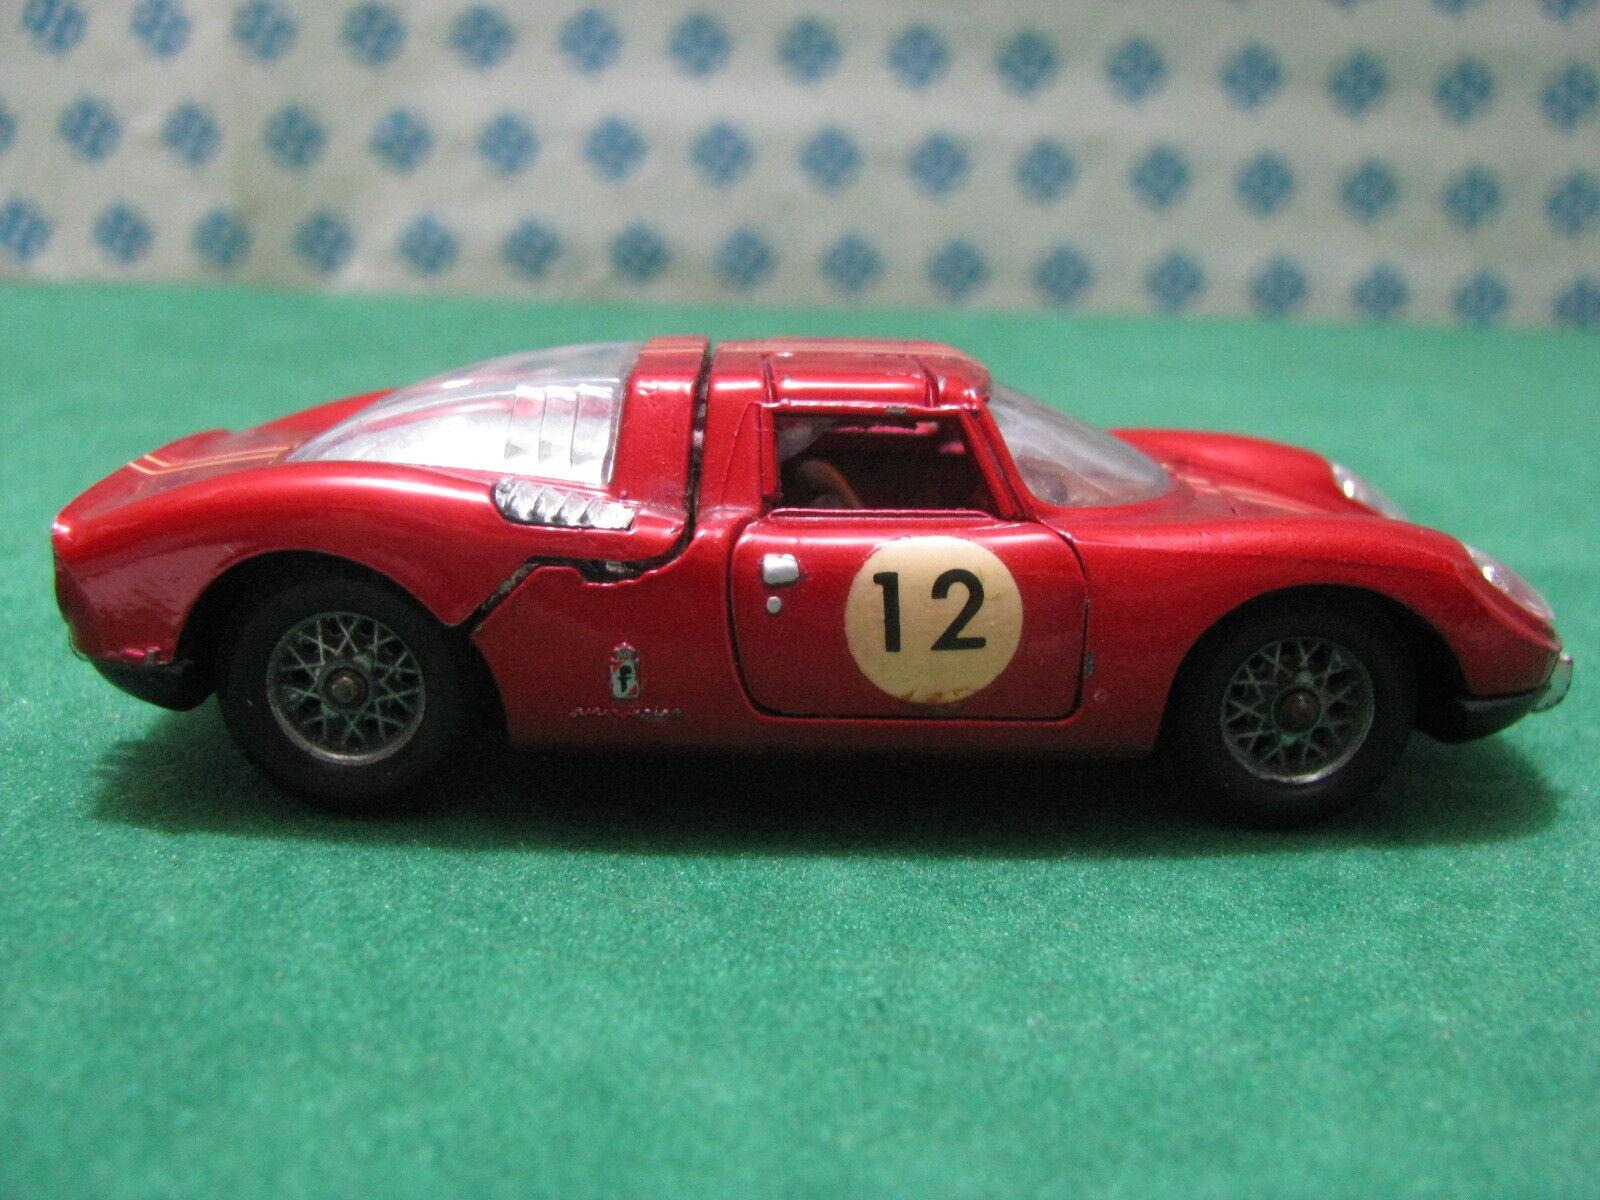 Vintage  -  FERRARI 250 Le Mans PininFarina    - 1 43  Politoys n° 525 6016d8